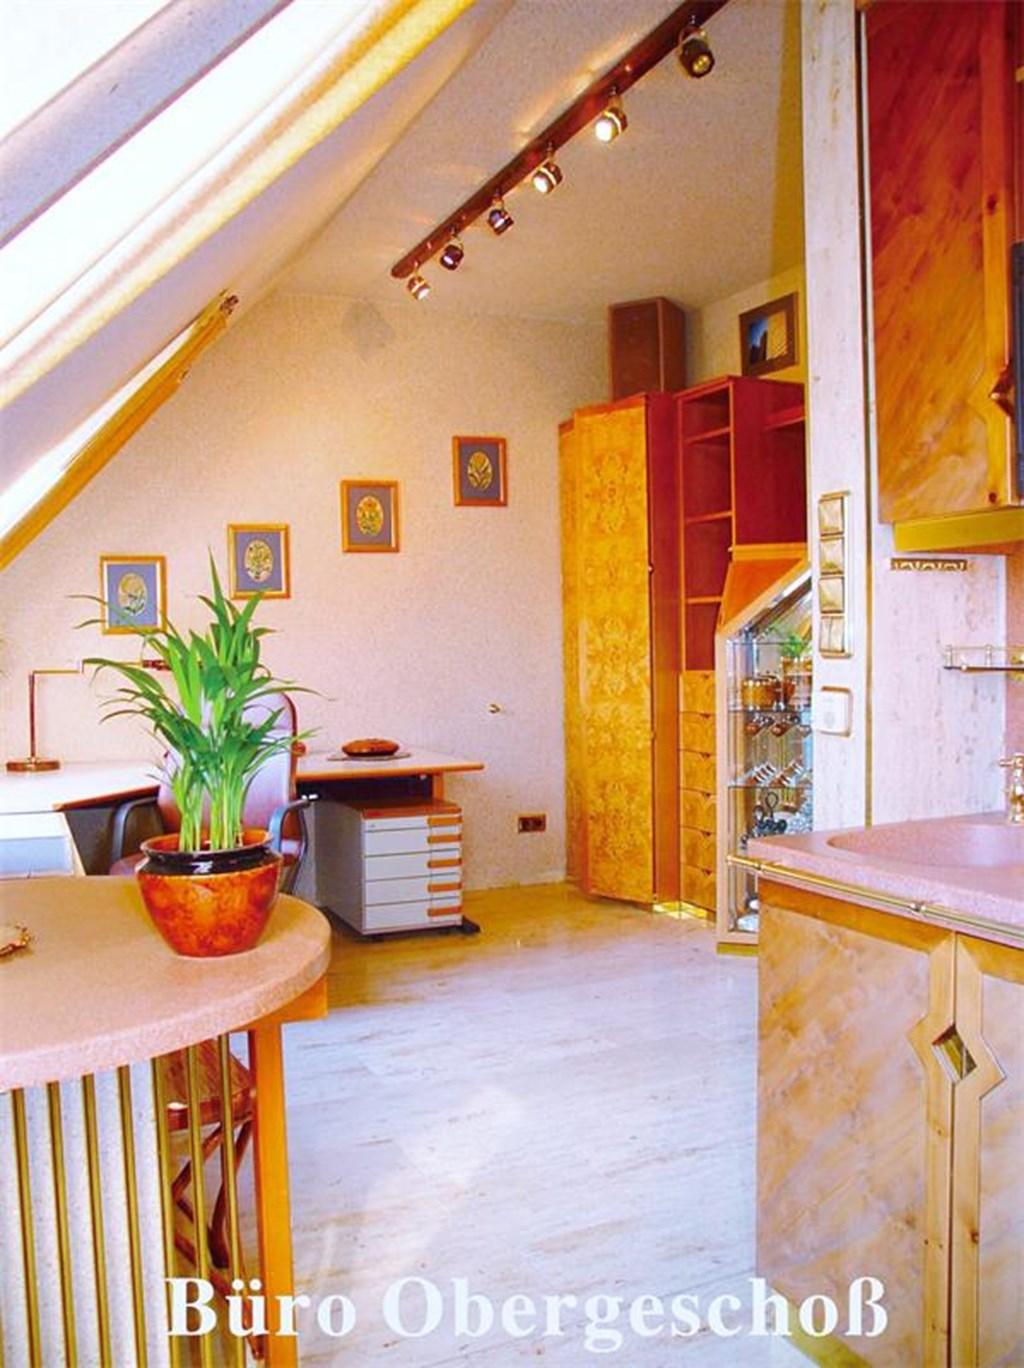 dachgeschossmaisonette mit potential in renommierter lage top preis leistungsverh ltnis. Black Bedroom Furniture Sets. Home Design Ideas